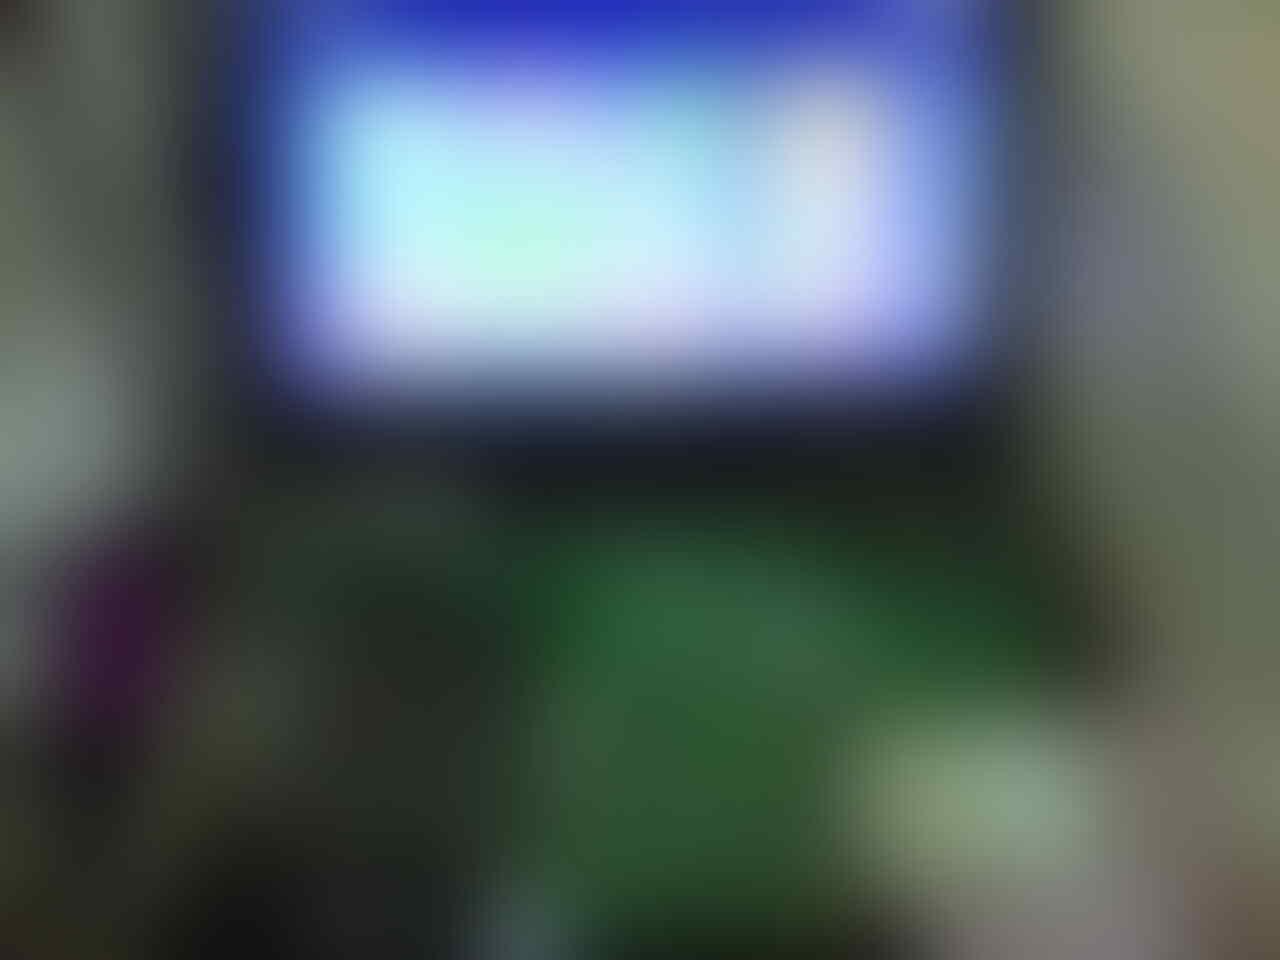 Pretelan DELL N4030 - Core i5